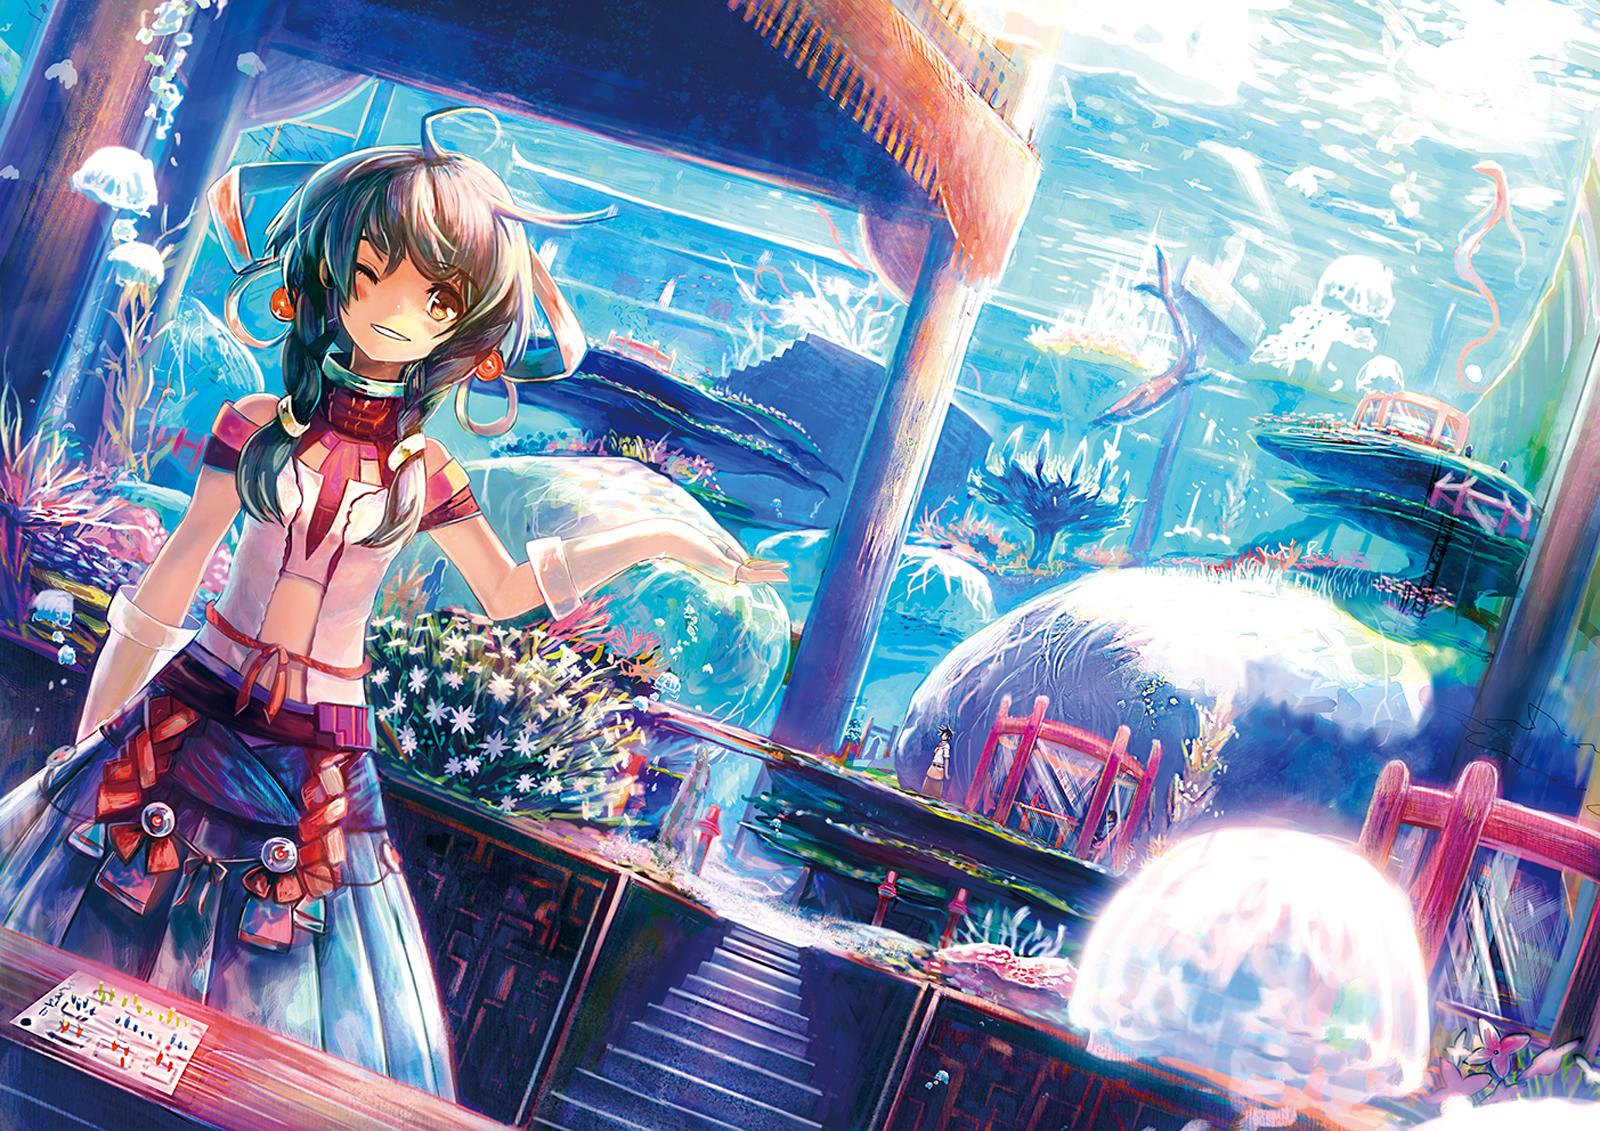 Hd Wallpaper Anime Girl Underwater Fantasy A52